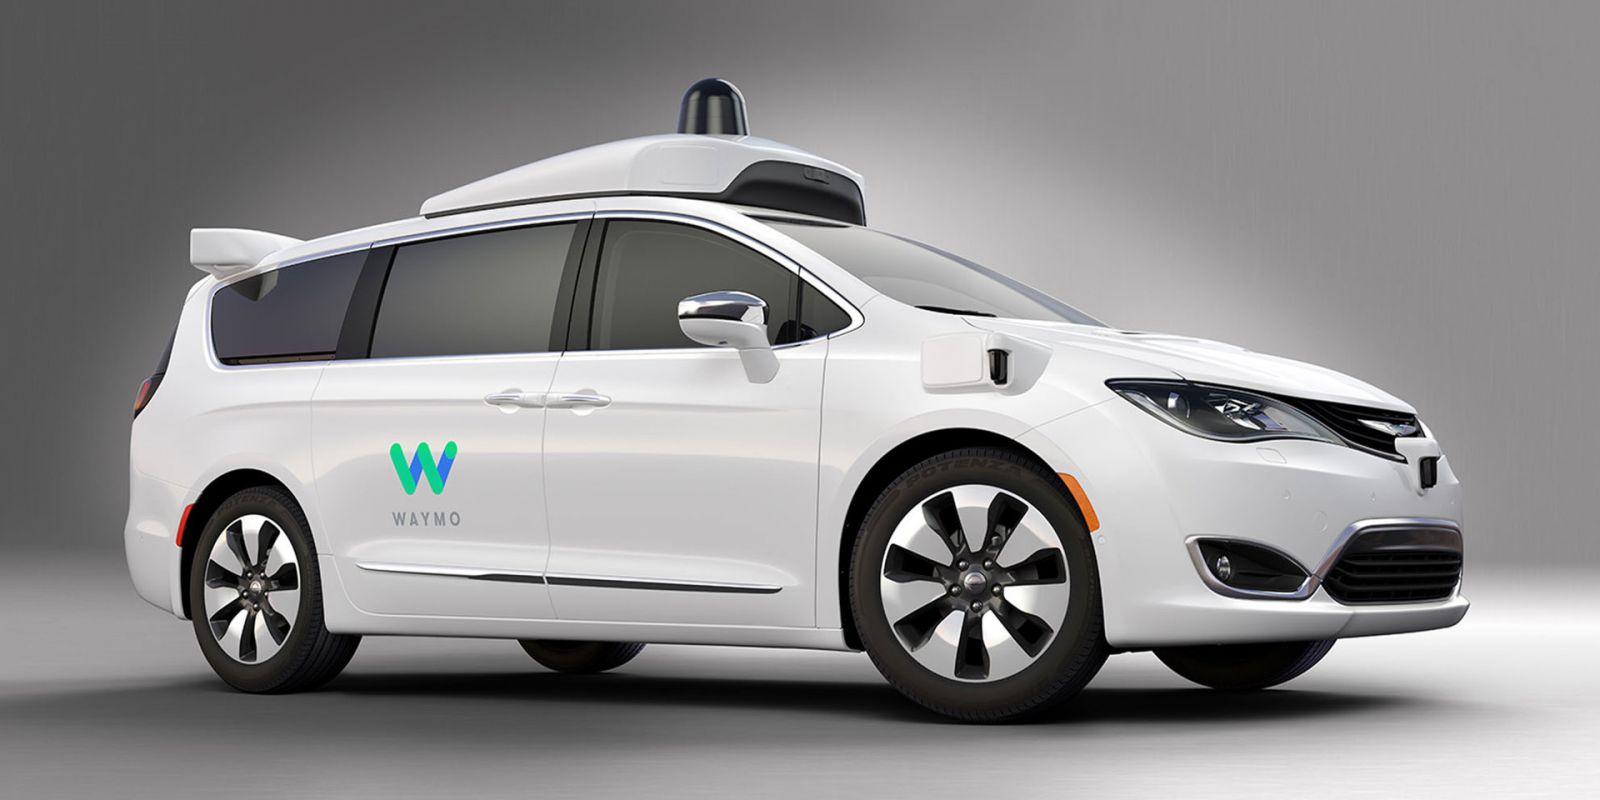 Waymo's Self-Driving Test Fleet To Undergo Massive Expansion